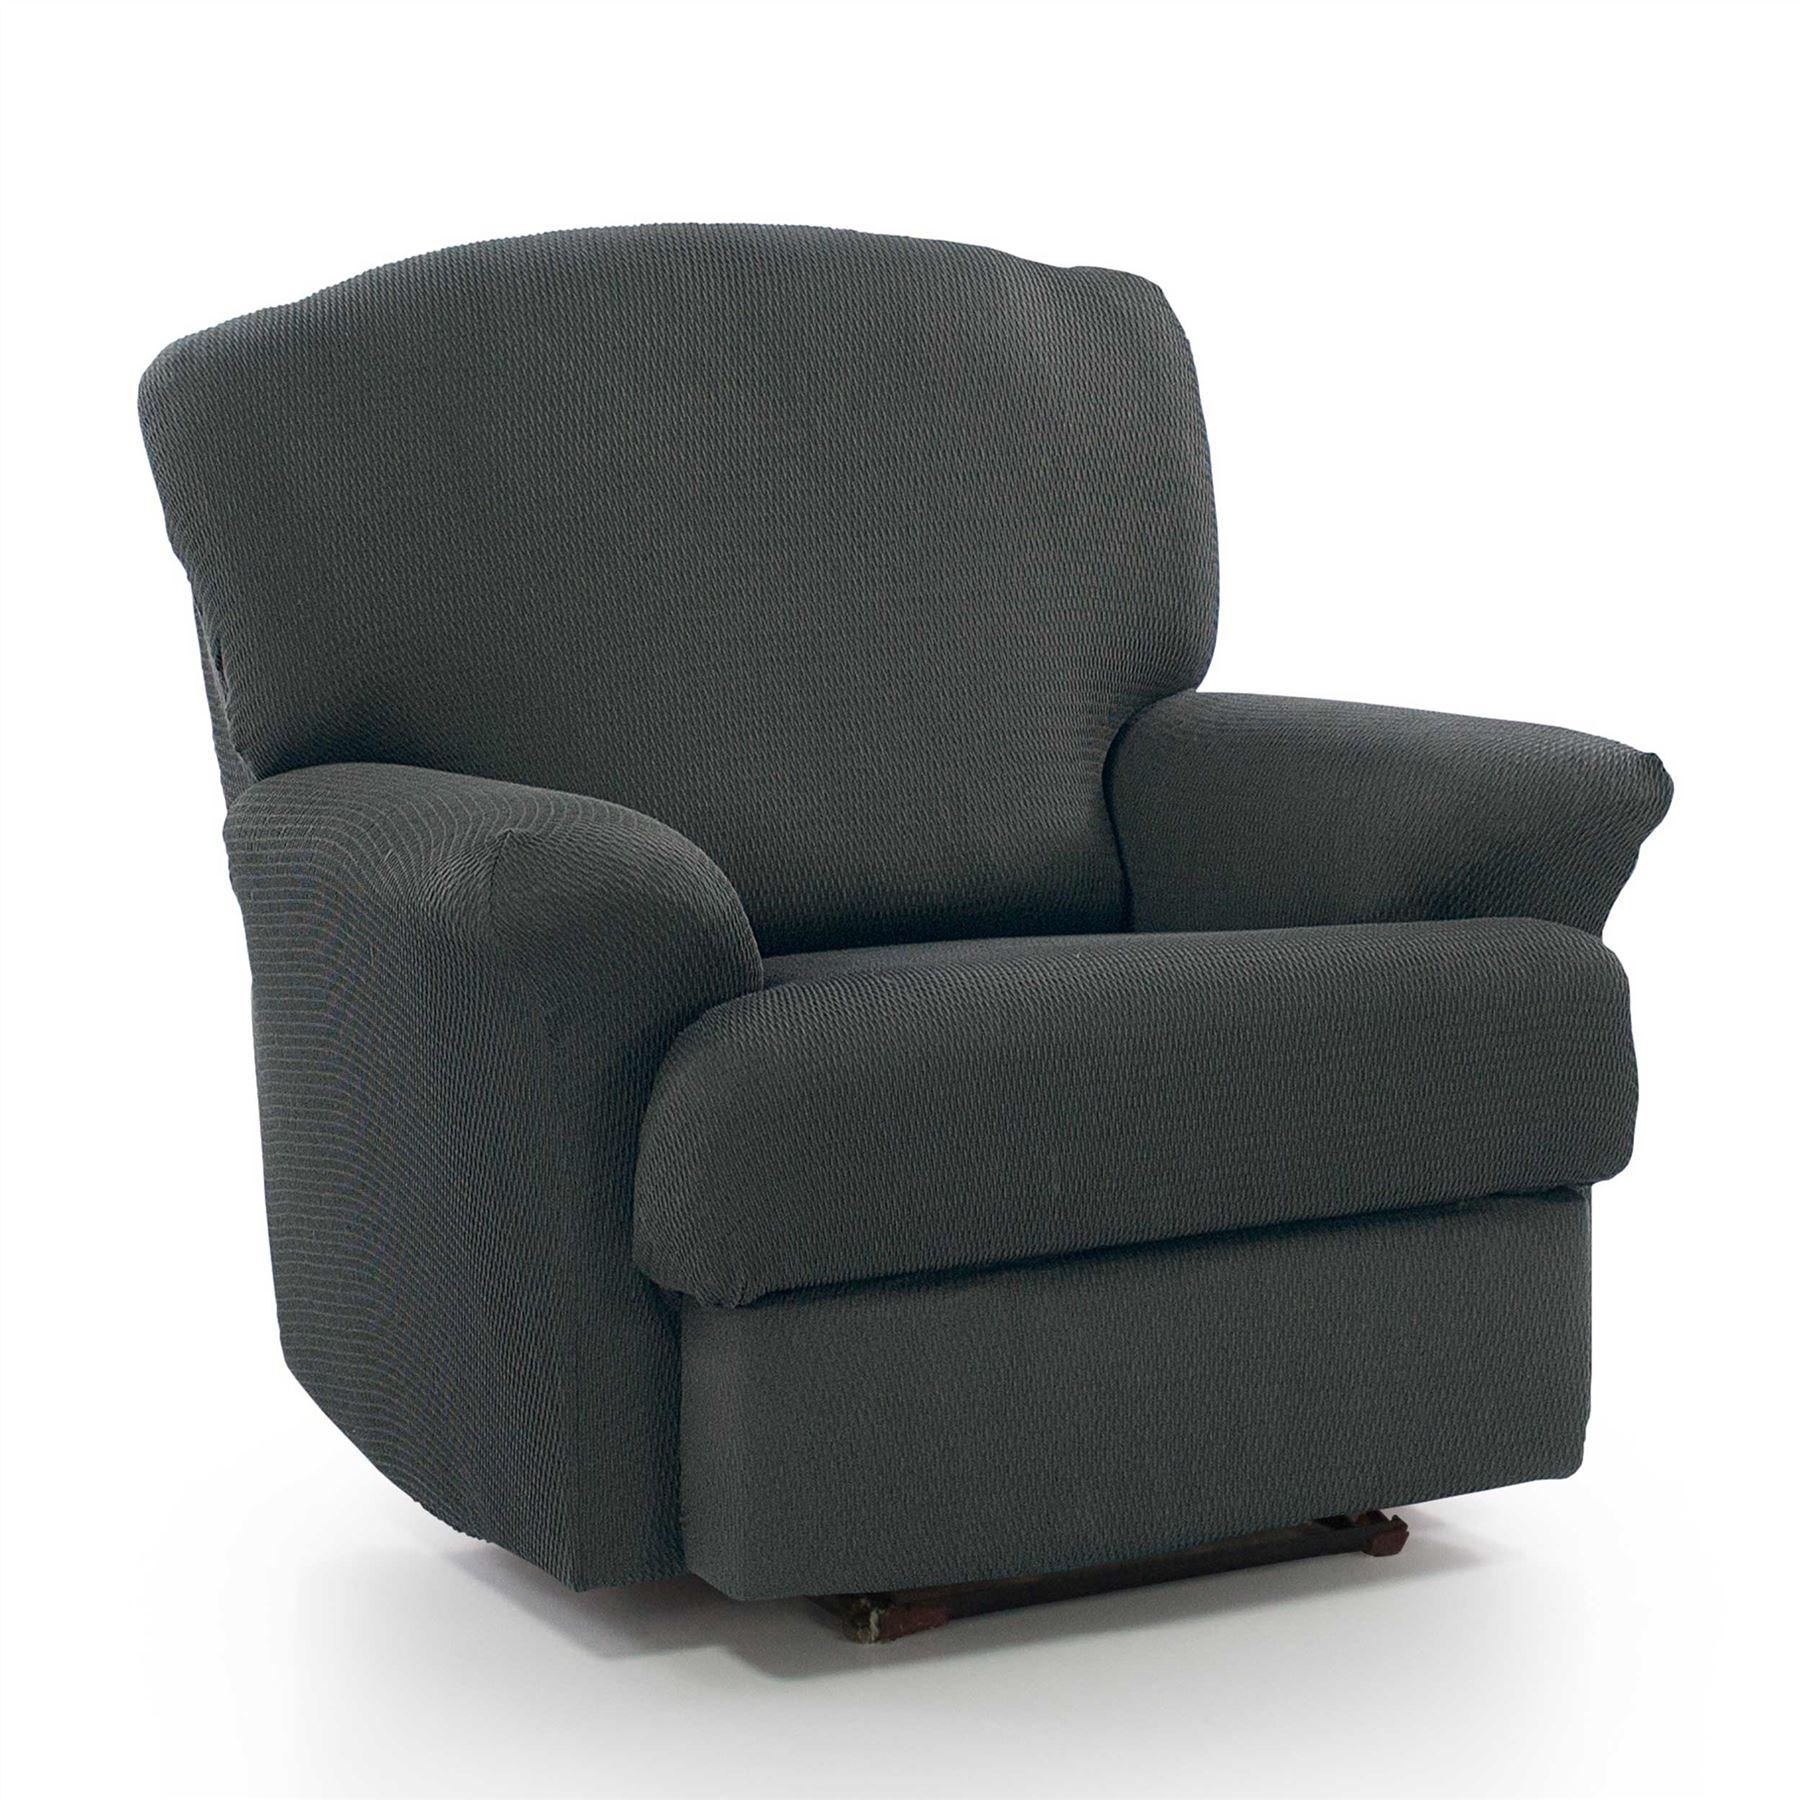 2 seater recliner sofa covers mia salon namestaja 1 armchair slipcover stretch elastic